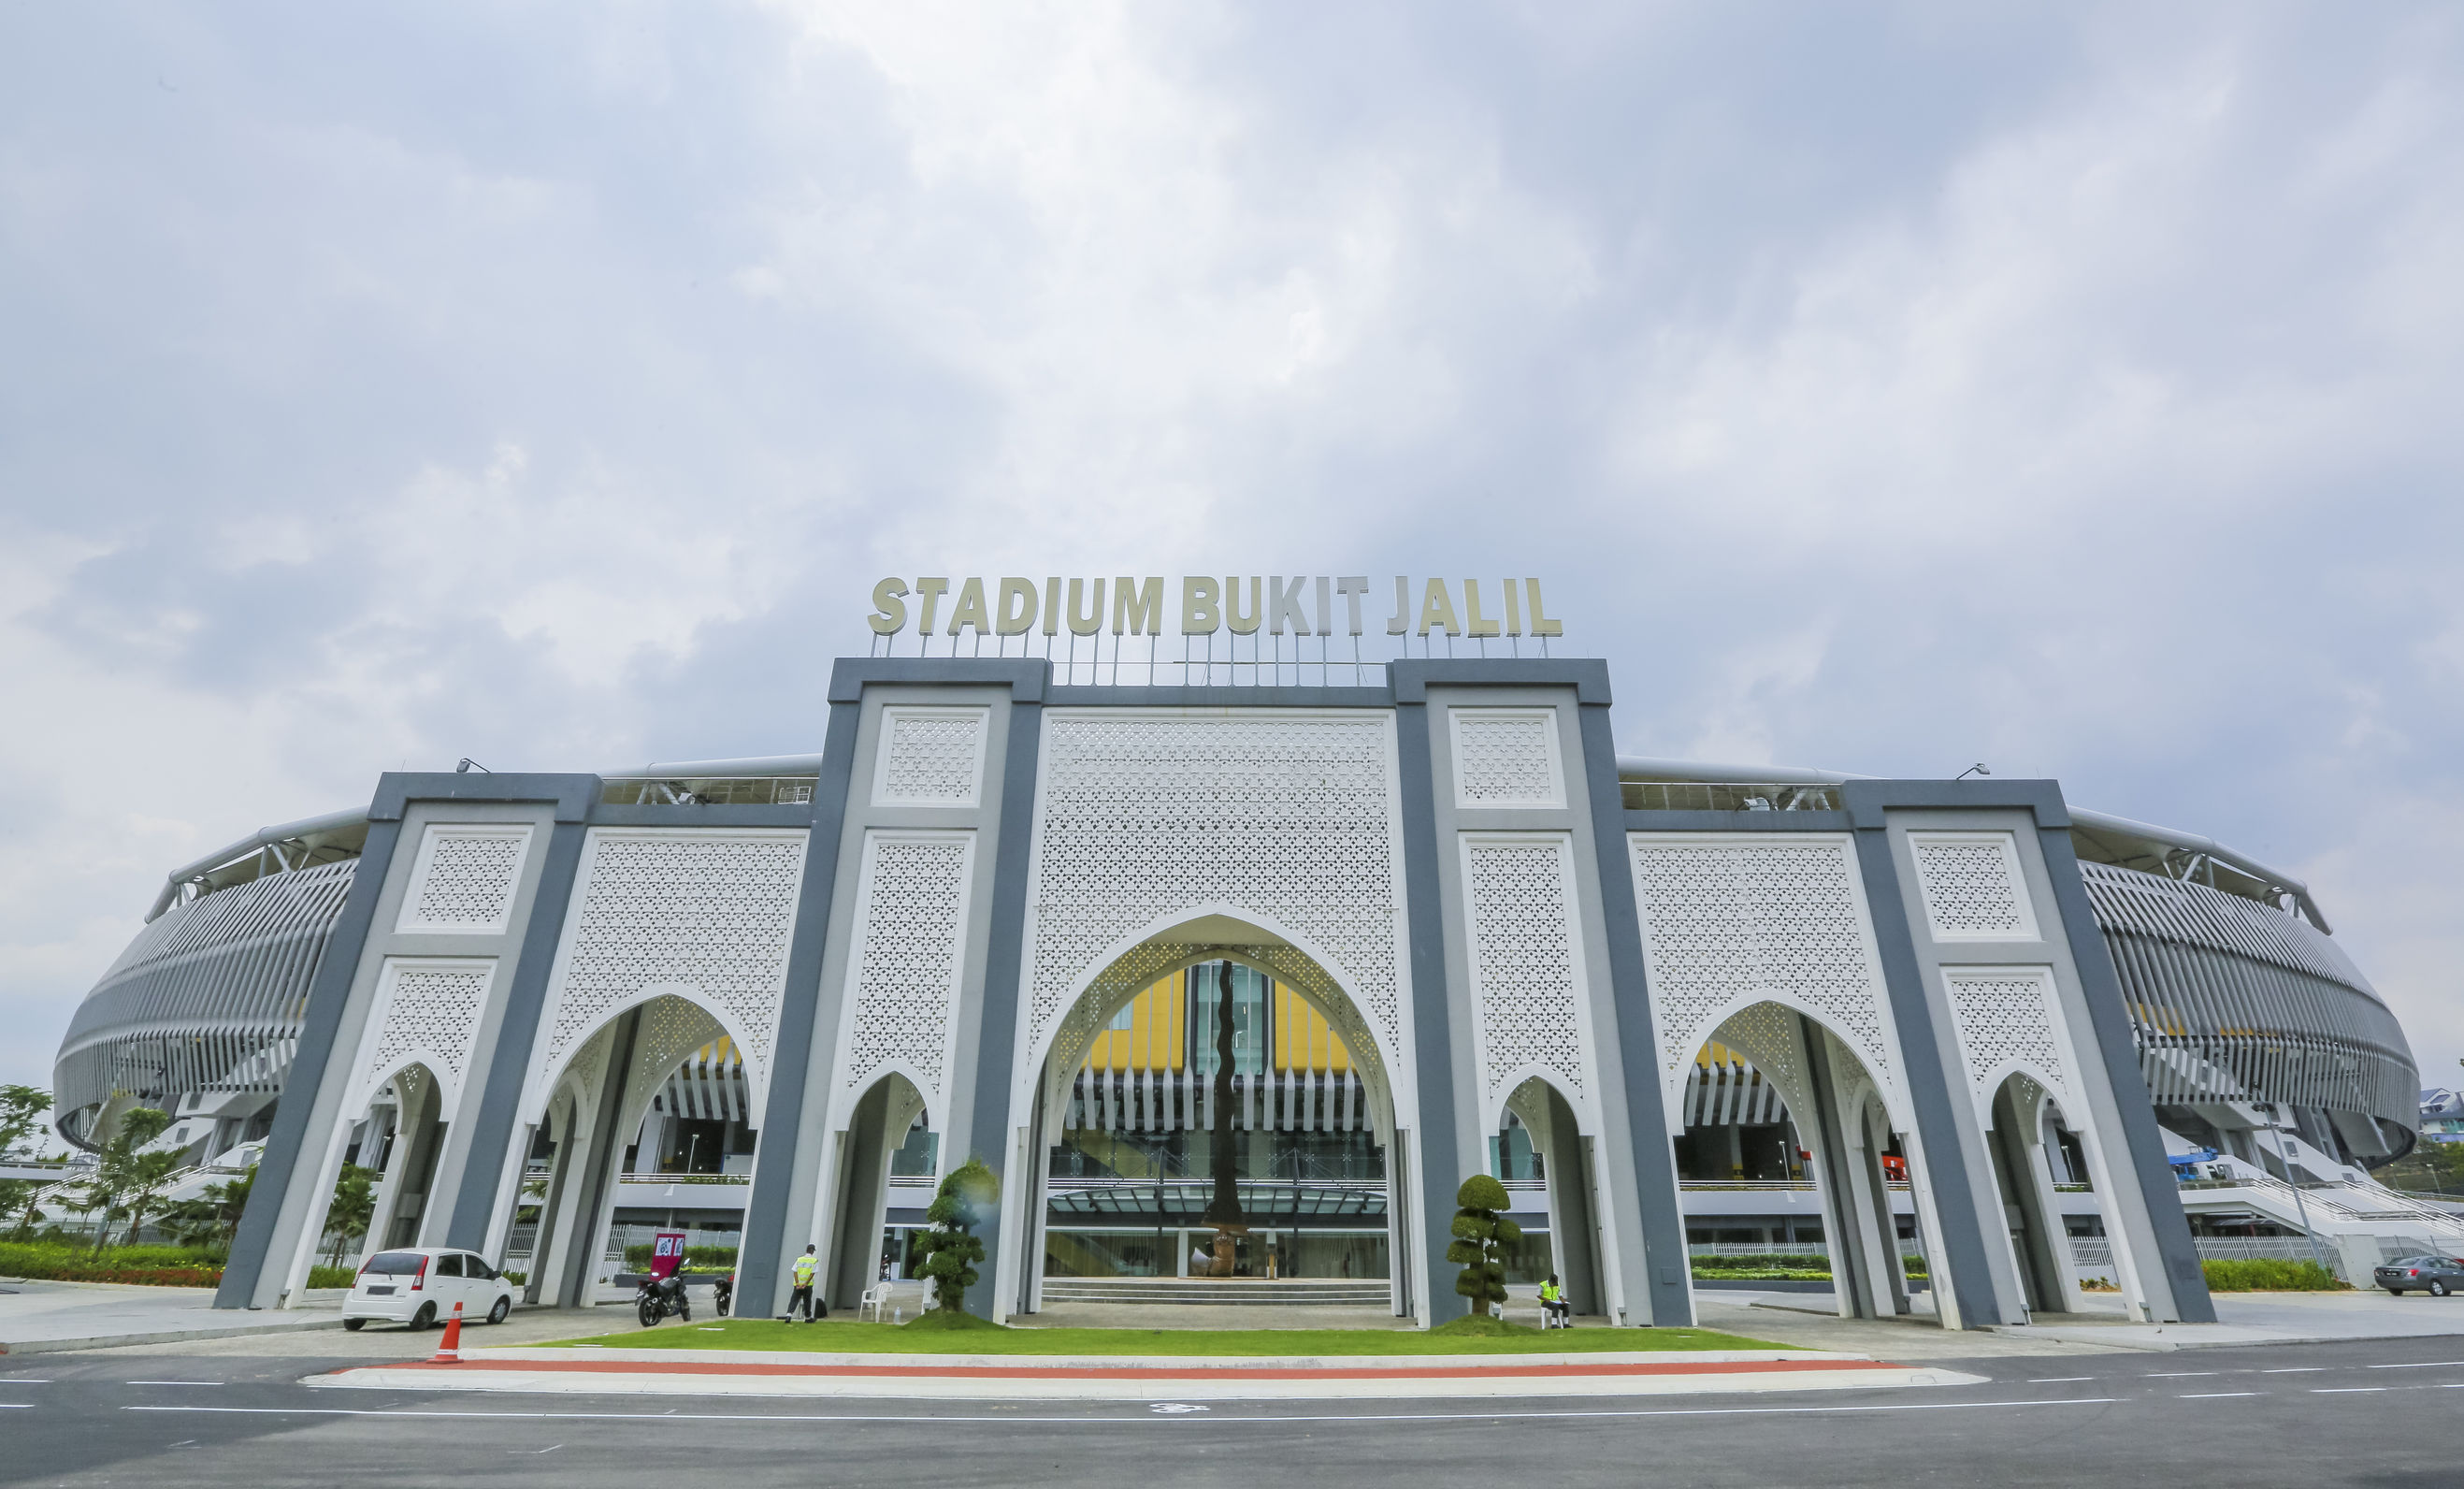 https://www.123rf.com/photo_83004674_national-stadium-bukit-jalil-kuala-lumpur-malaysia-kl-sports-city-.html?term=bukit%2Bjalil%2Bstadium&vti=lwunn4hb4df4h741si-4-92